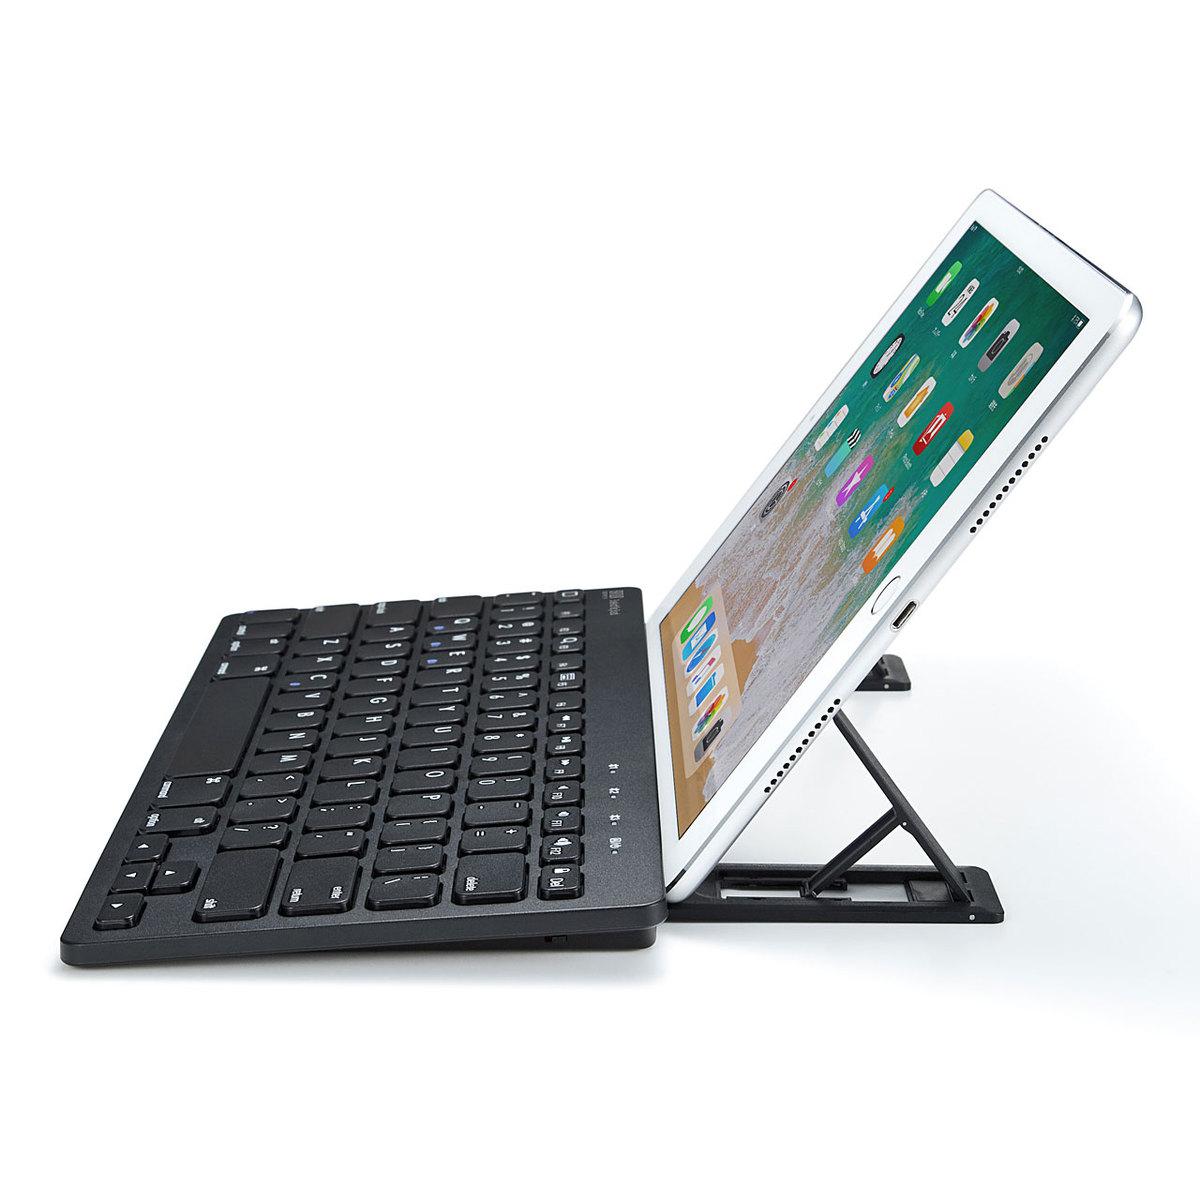 [SKB-BT28BK] タブレットスタンド機能付き Bluetoothキーボード